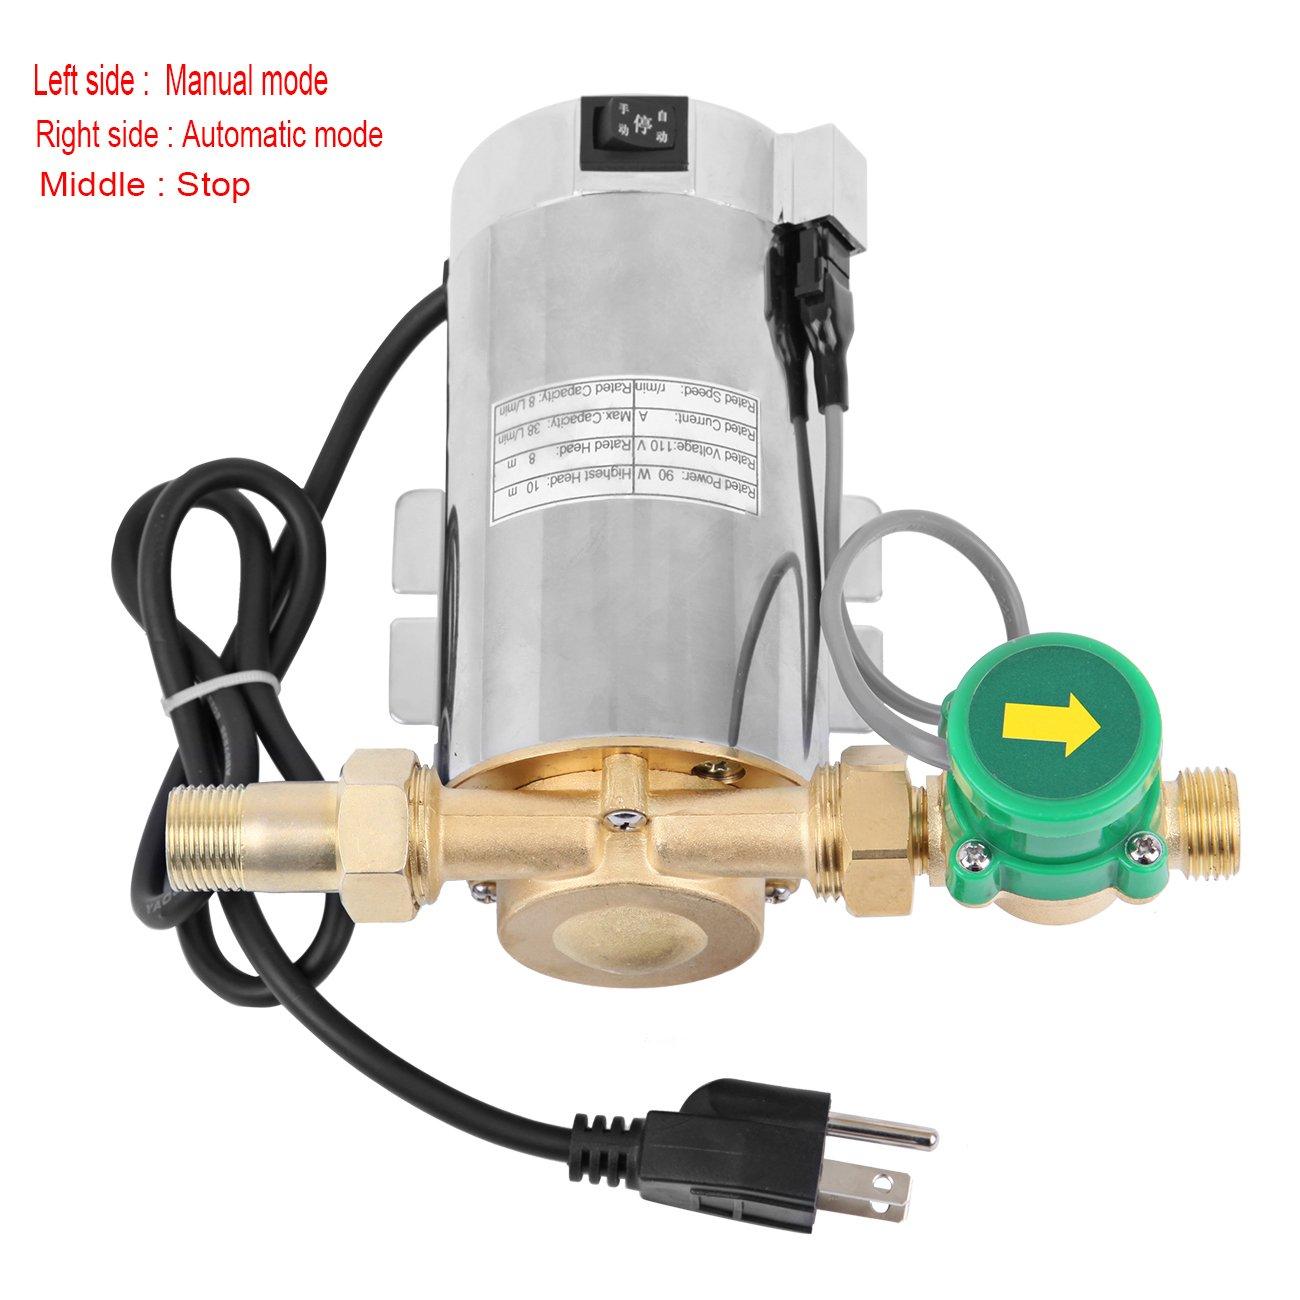 90W Electronic Automatic Water Booster Pump for Shower Washing Machine - Ridgeyard by Ridgeyard co,.ltd